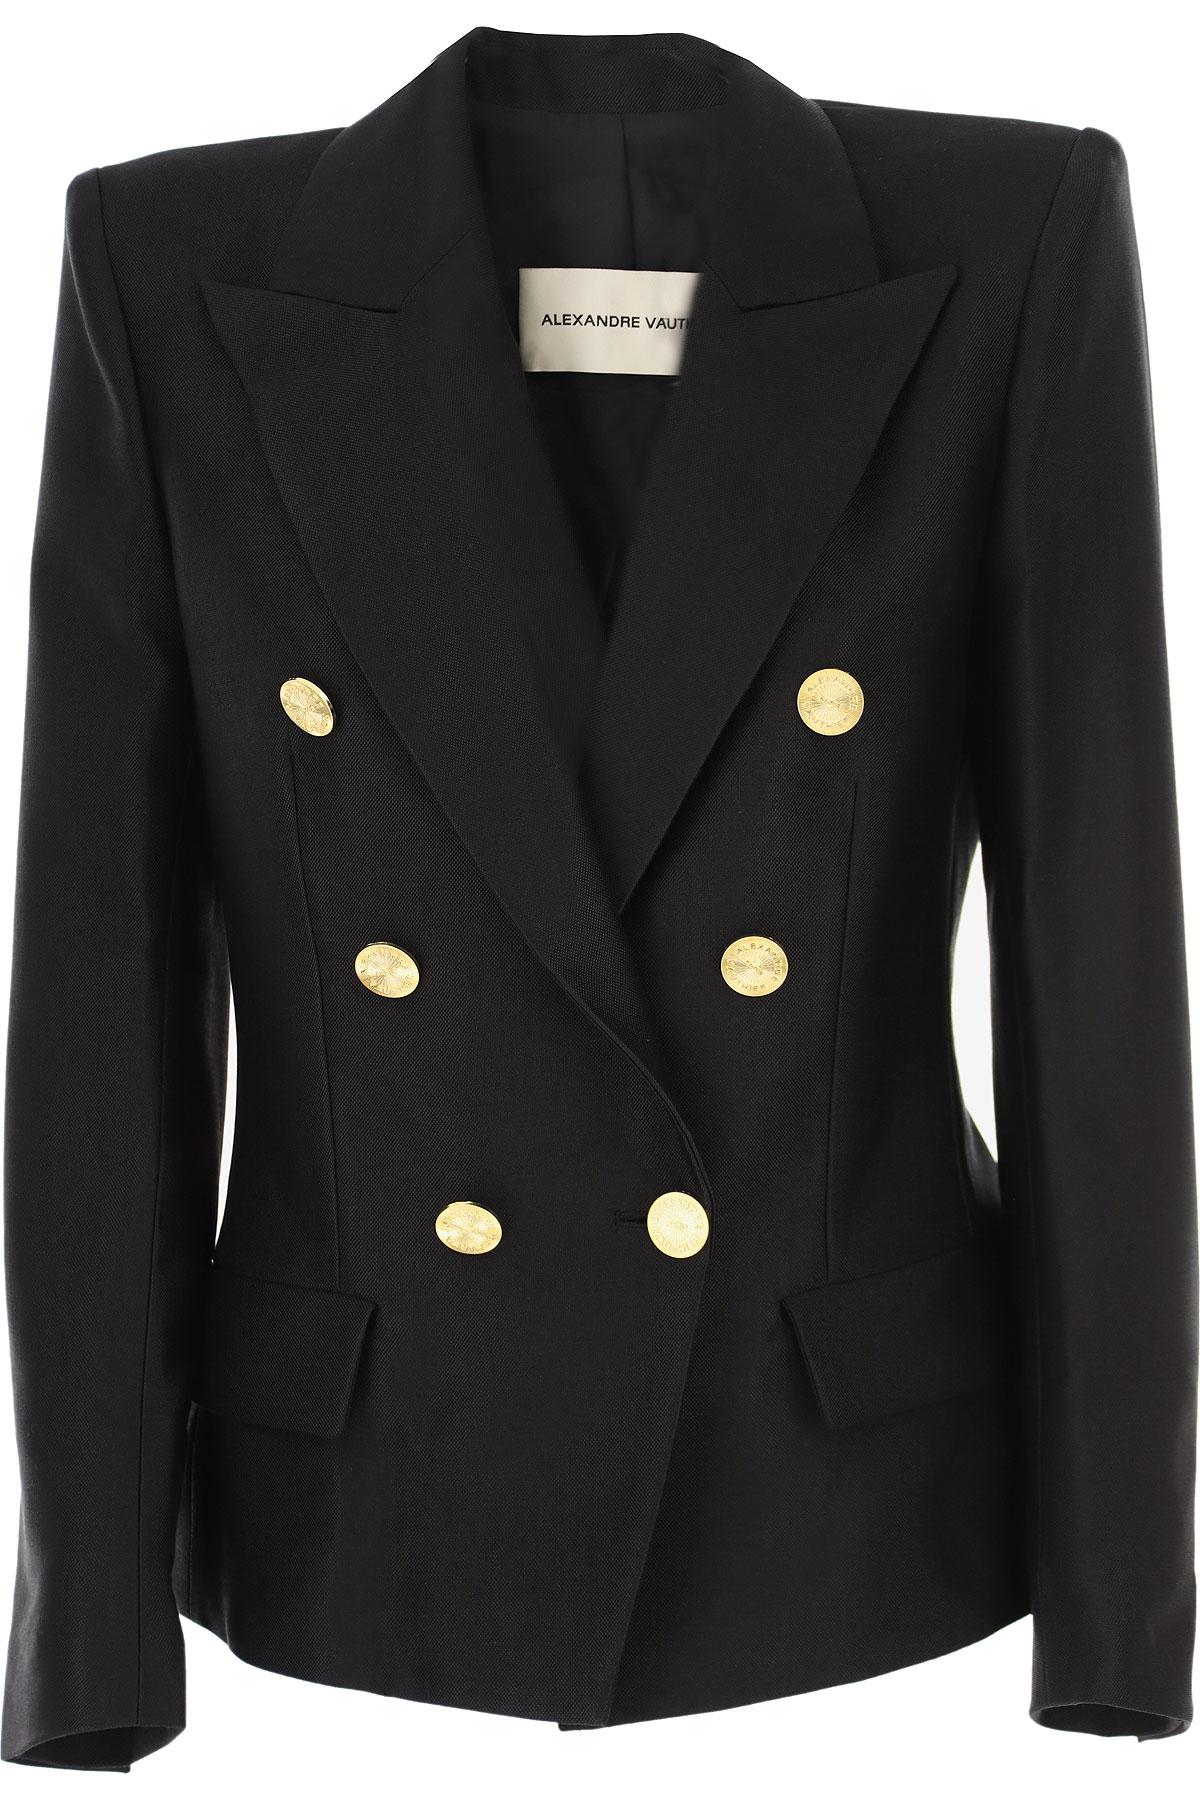 Alexandre Vauthier Blazer for Women On Sale, Black, Cotton, 2019, 2 4